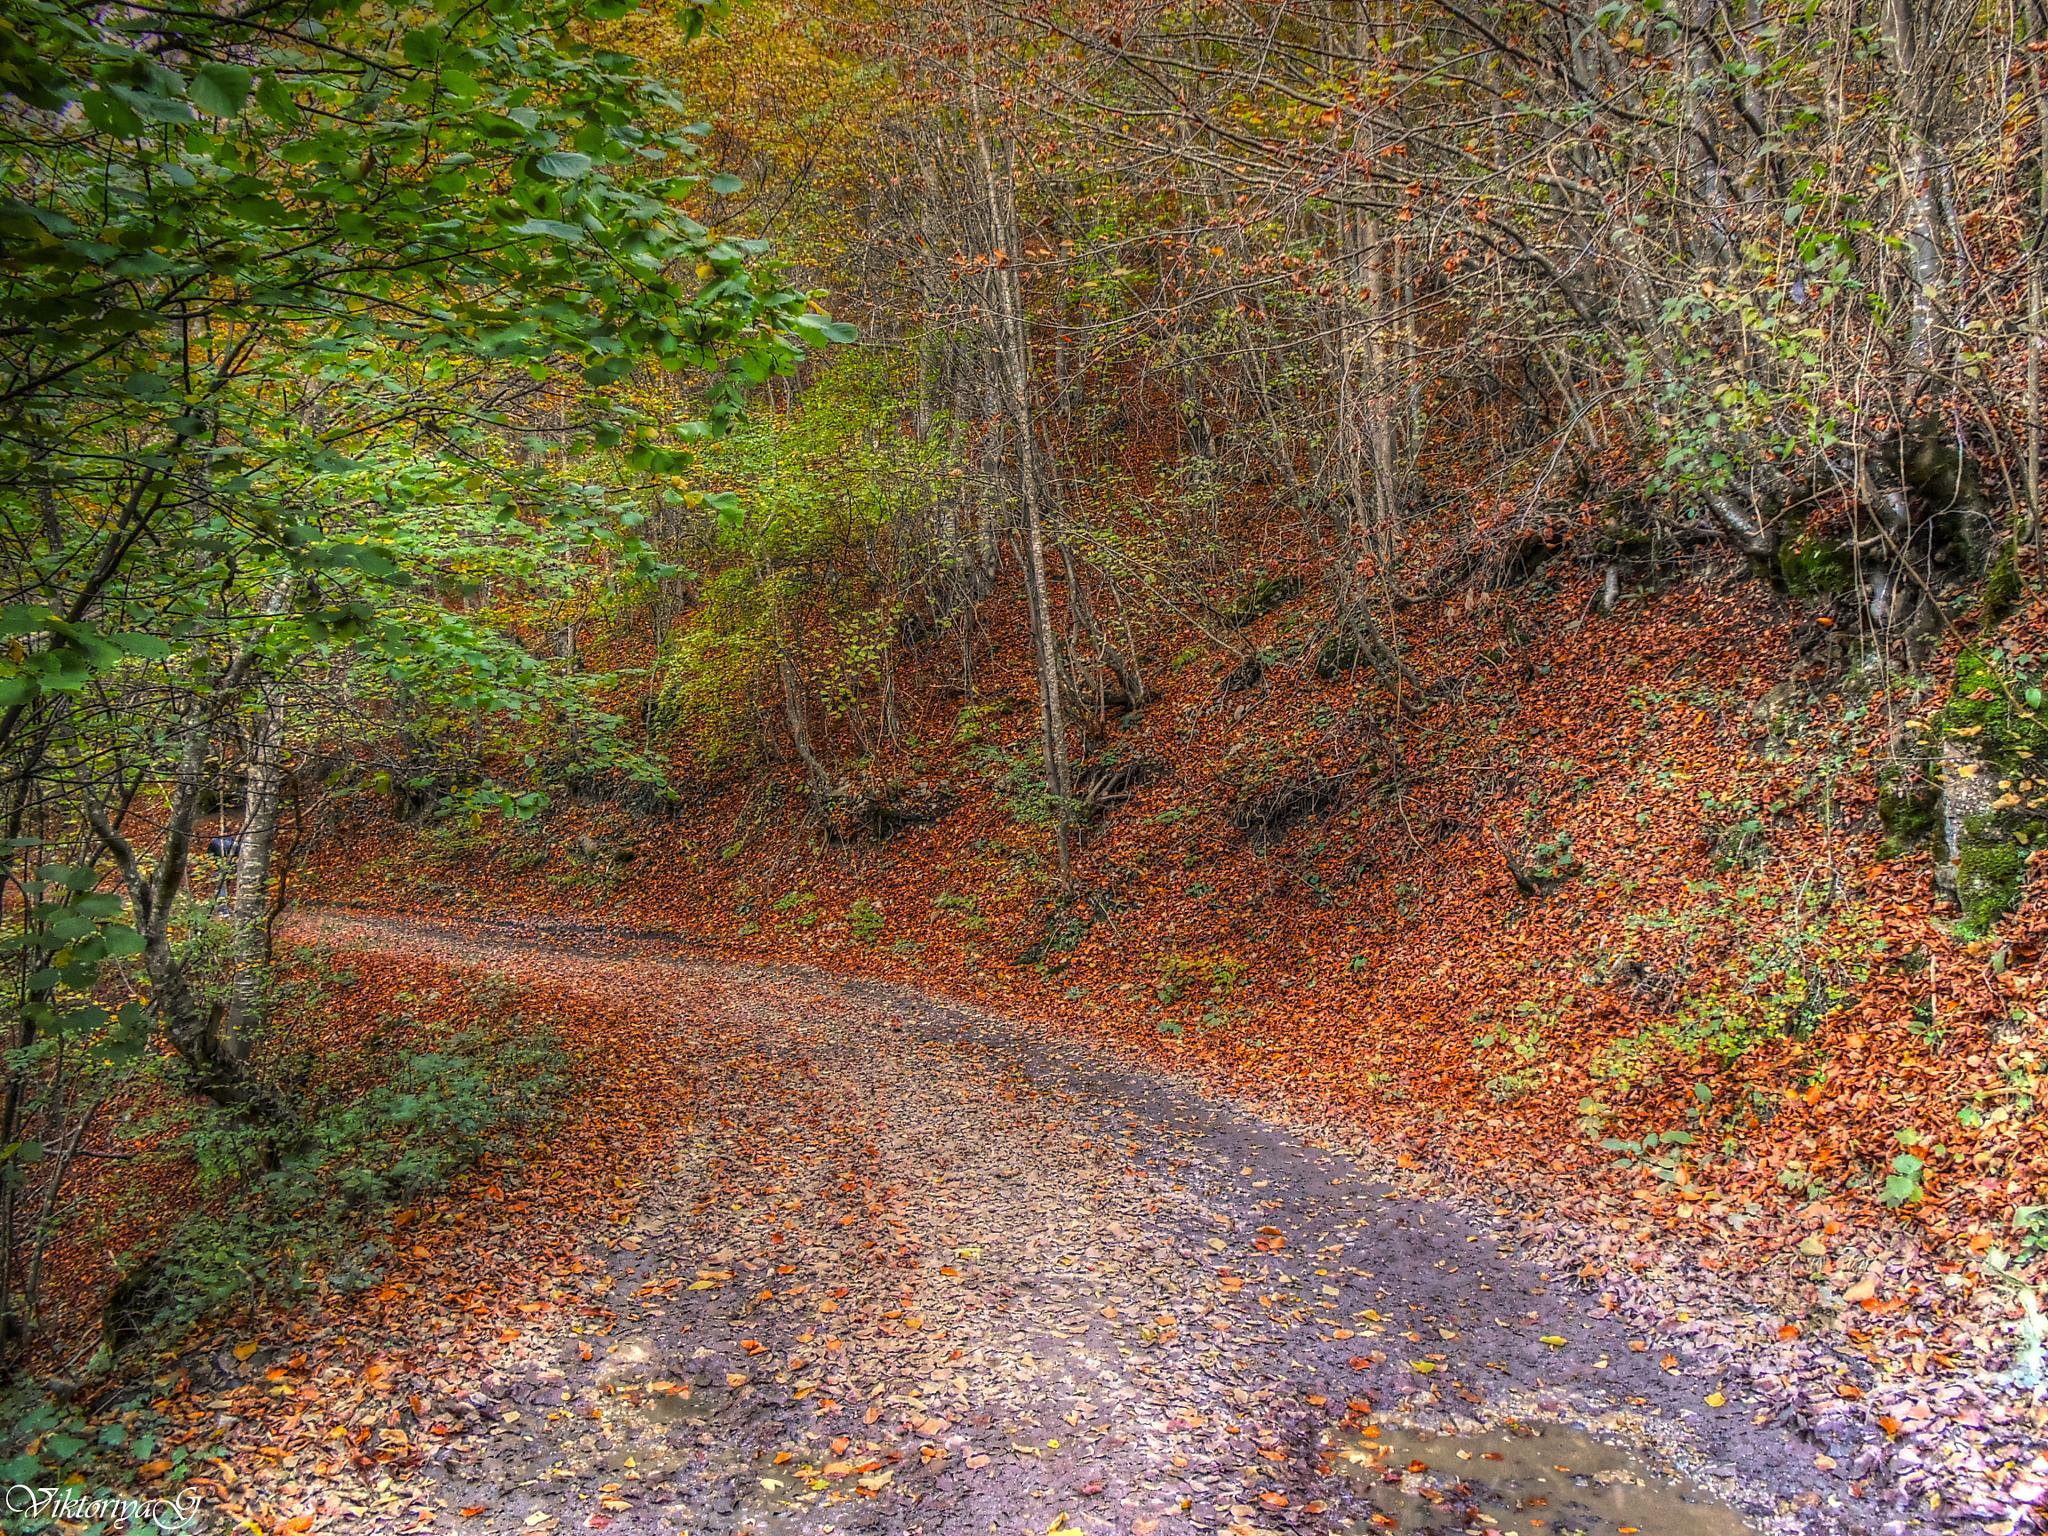 Autumn Landscape by Viktoriya Georgieva